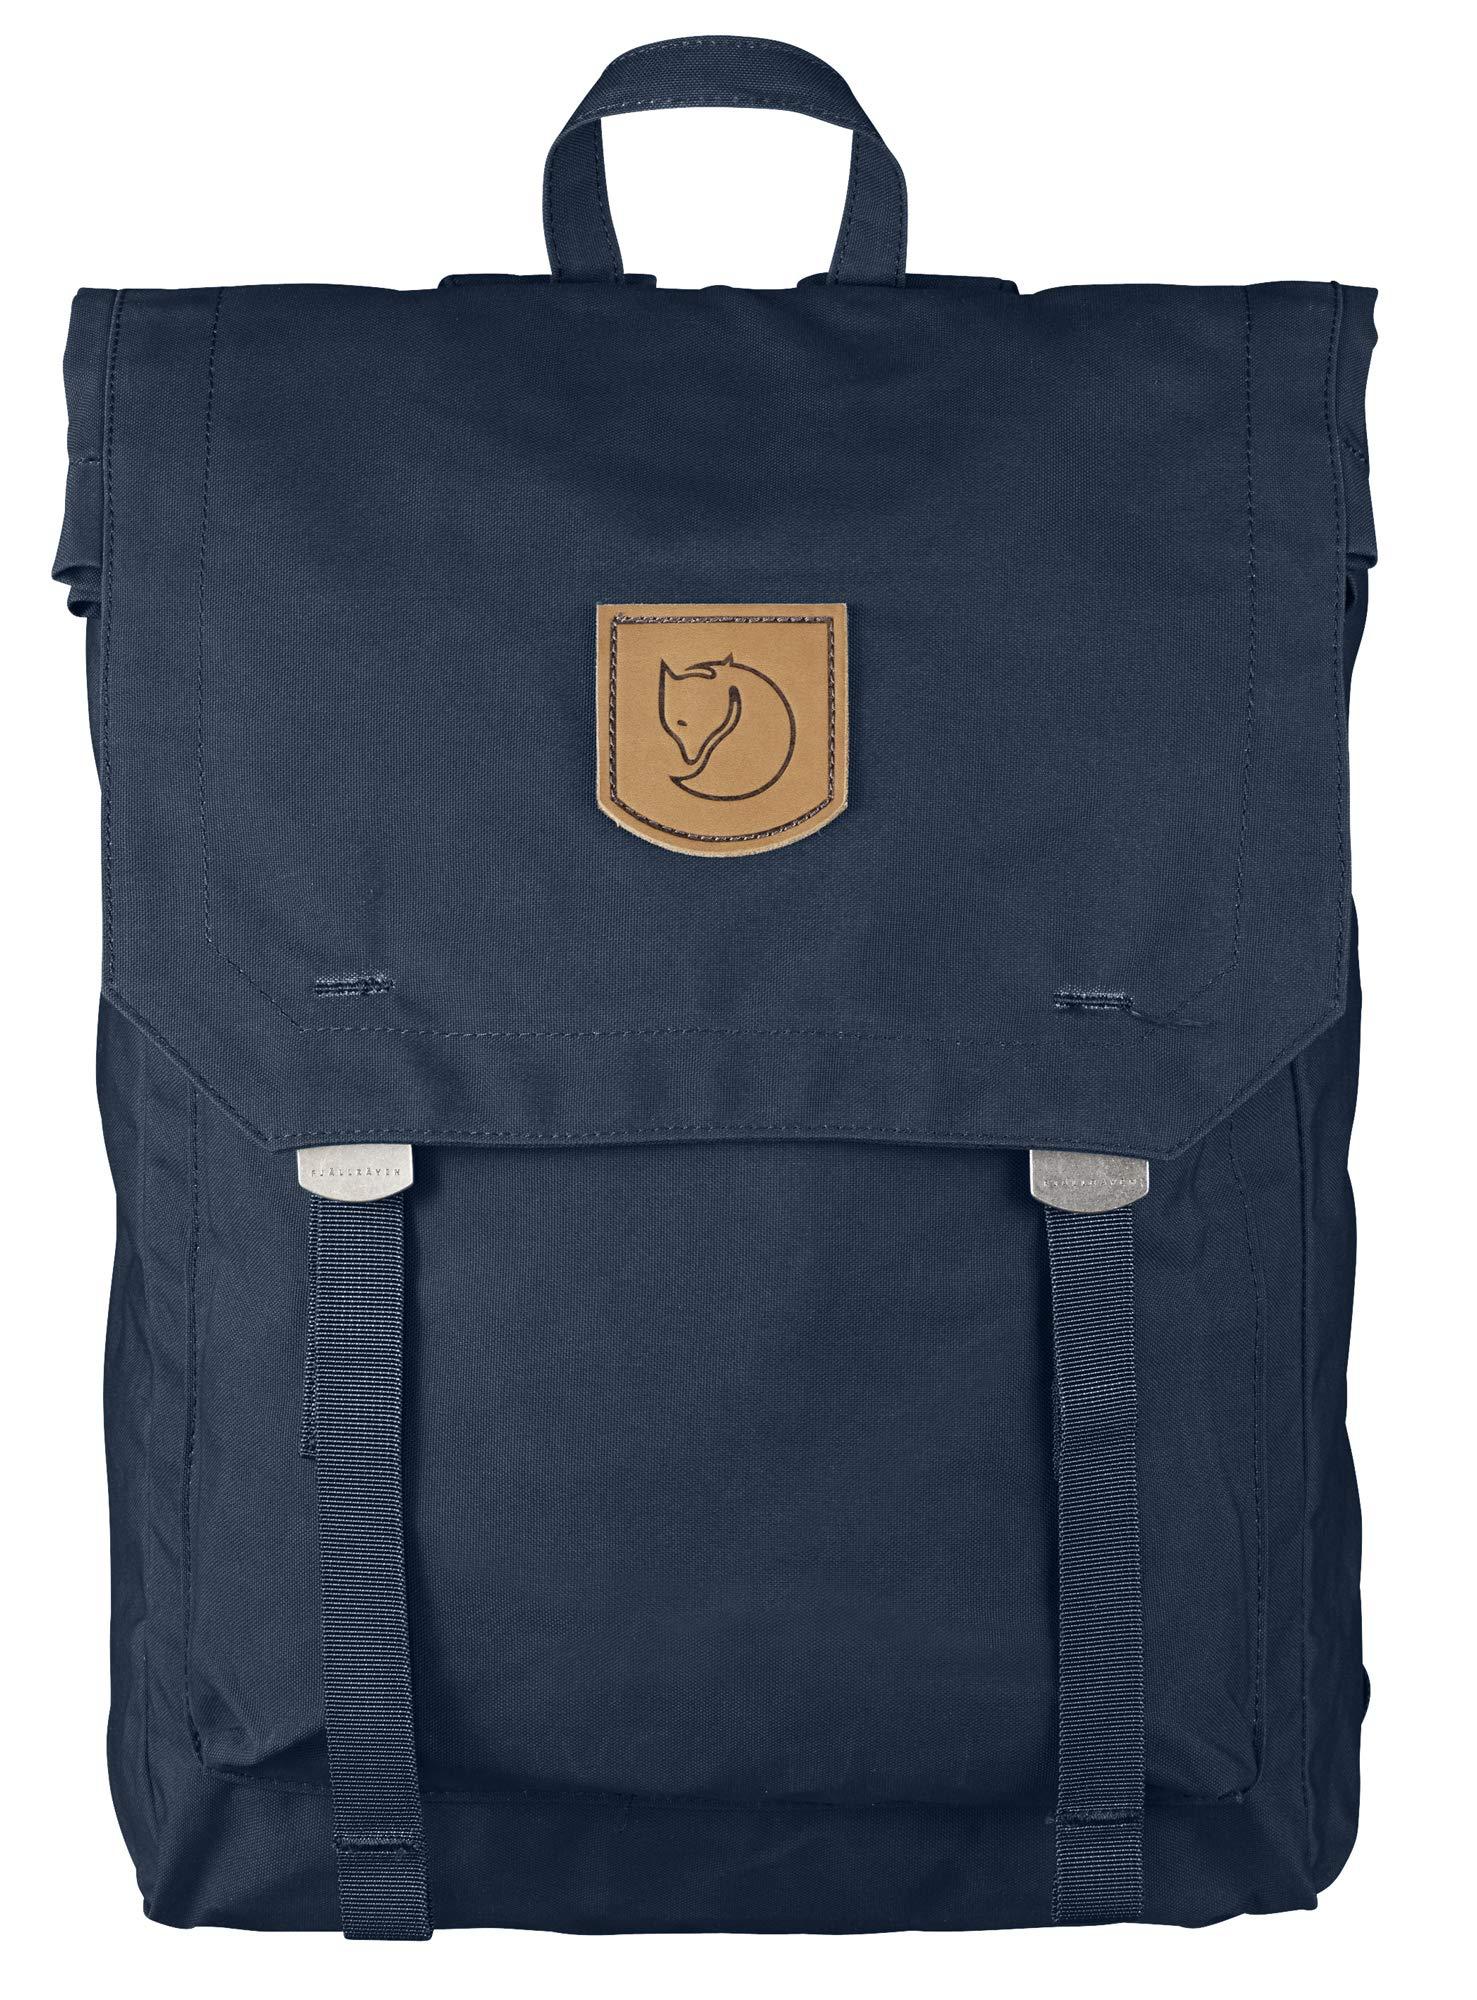 Fjallraven - Foldsack No. 1 Backpack, Fits 15'' Laptops, Navy by Fjallraven